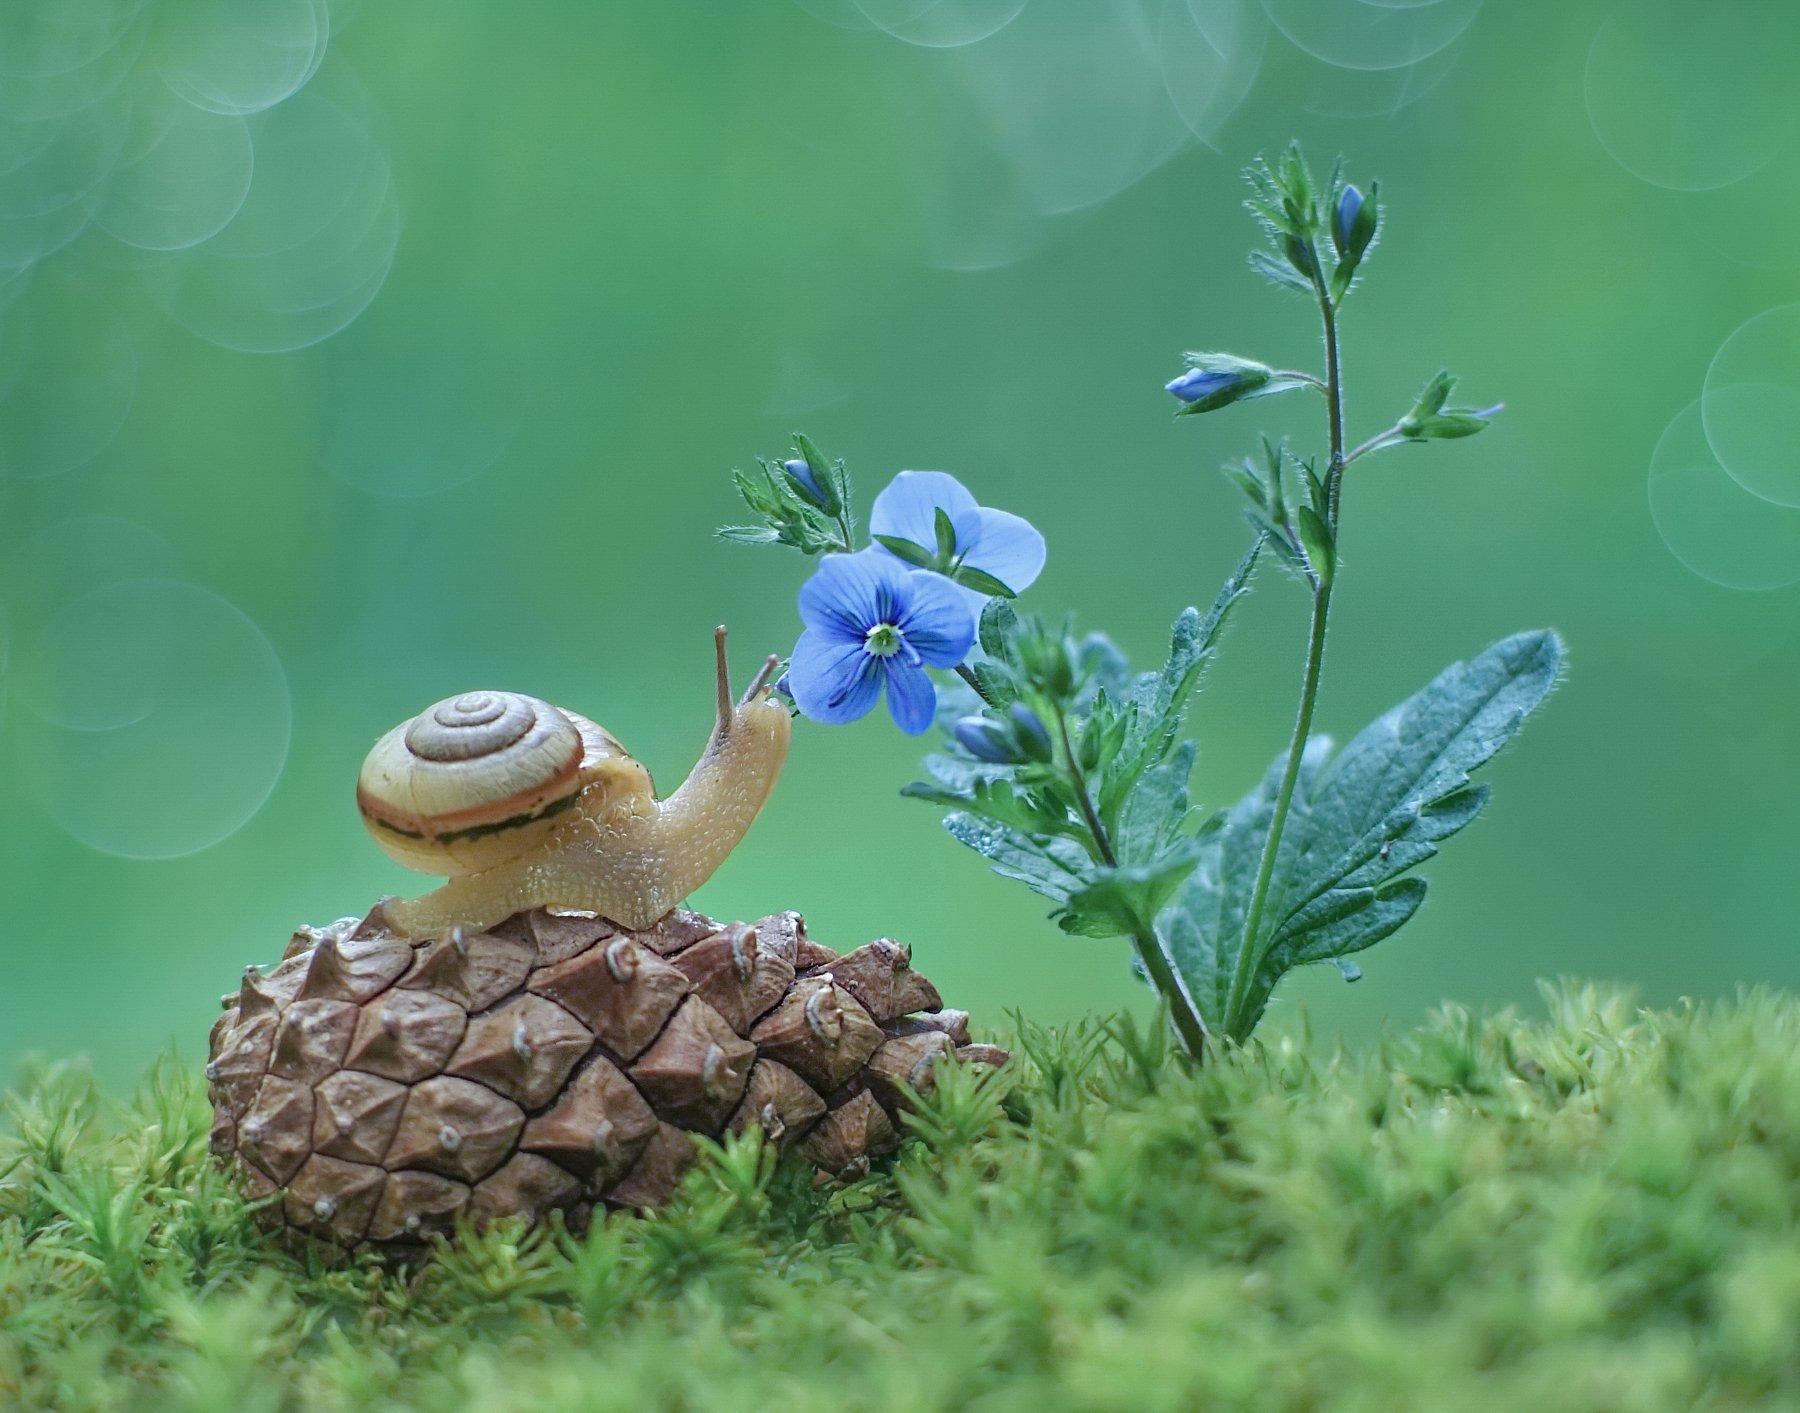 улитка, лето, природа, Александр Гвоздь